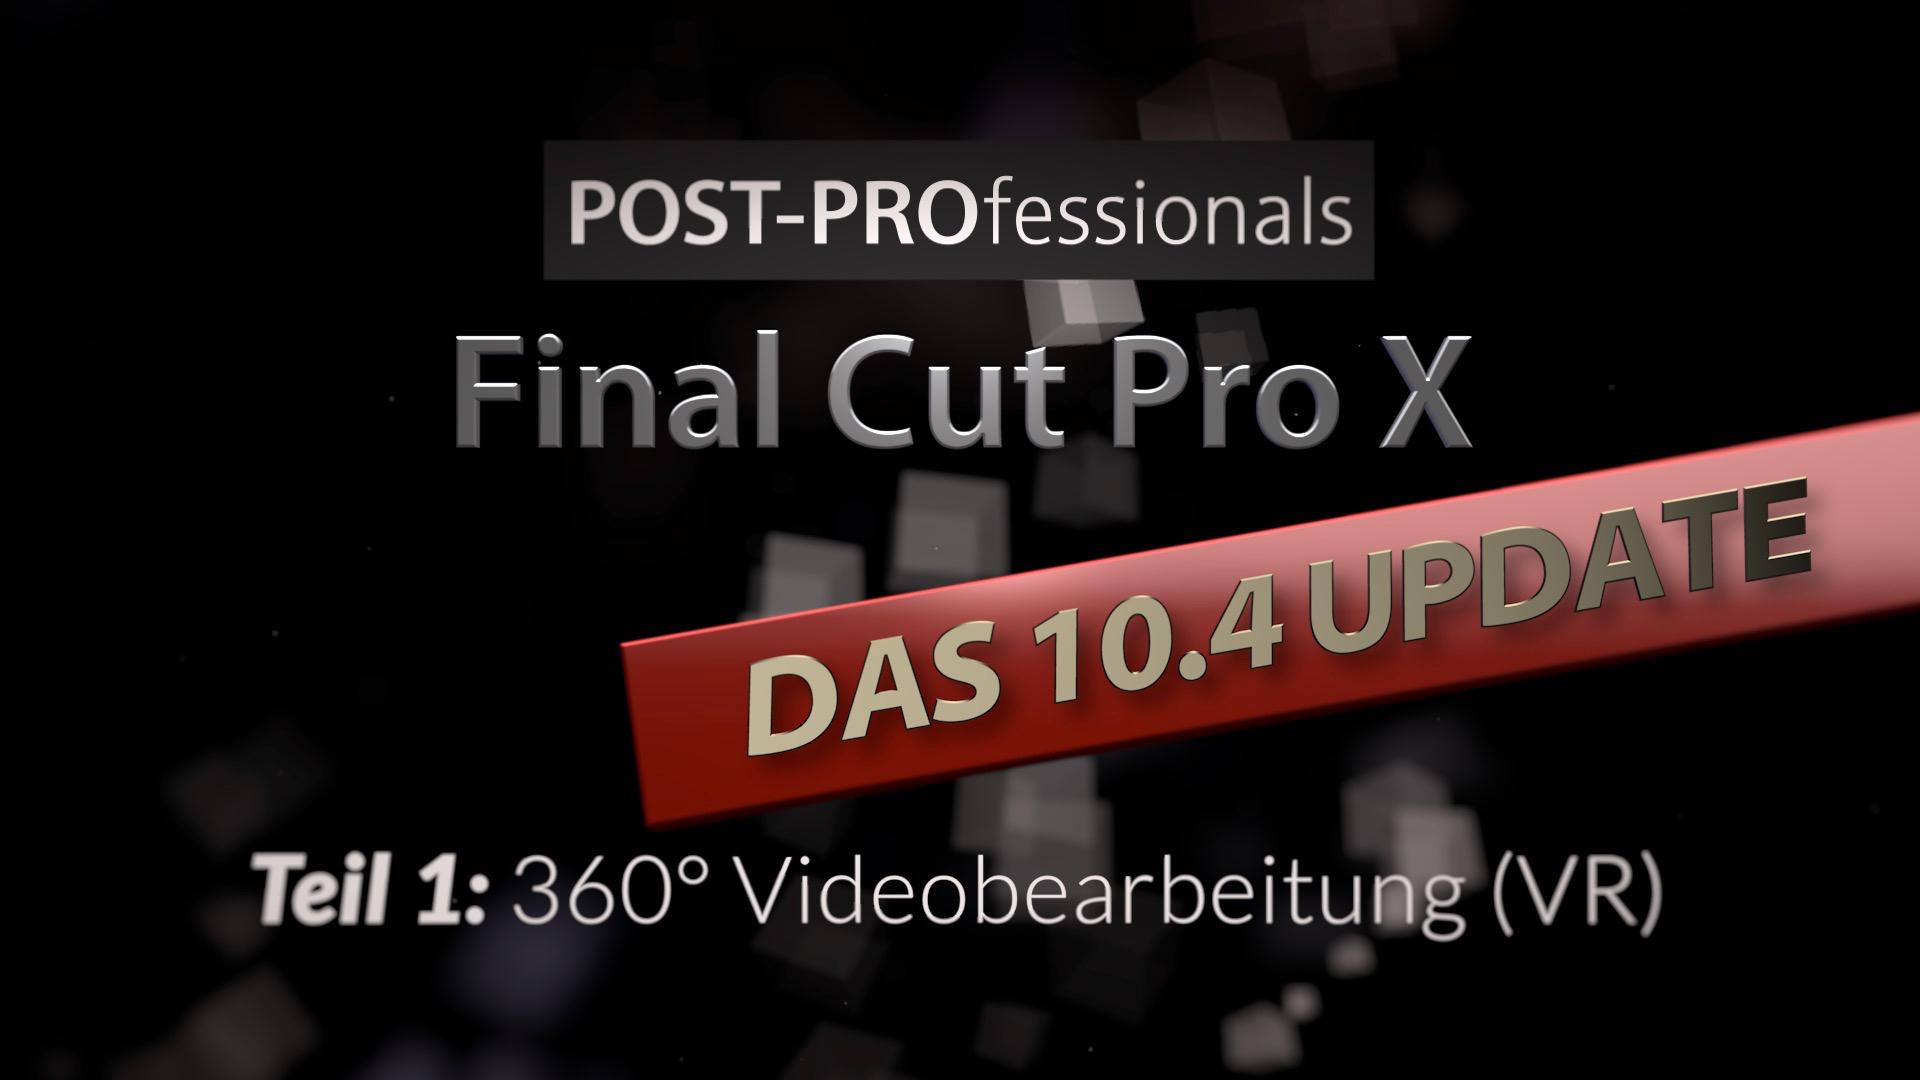 FCP X 10.4 VR 360° Videobearbeitung